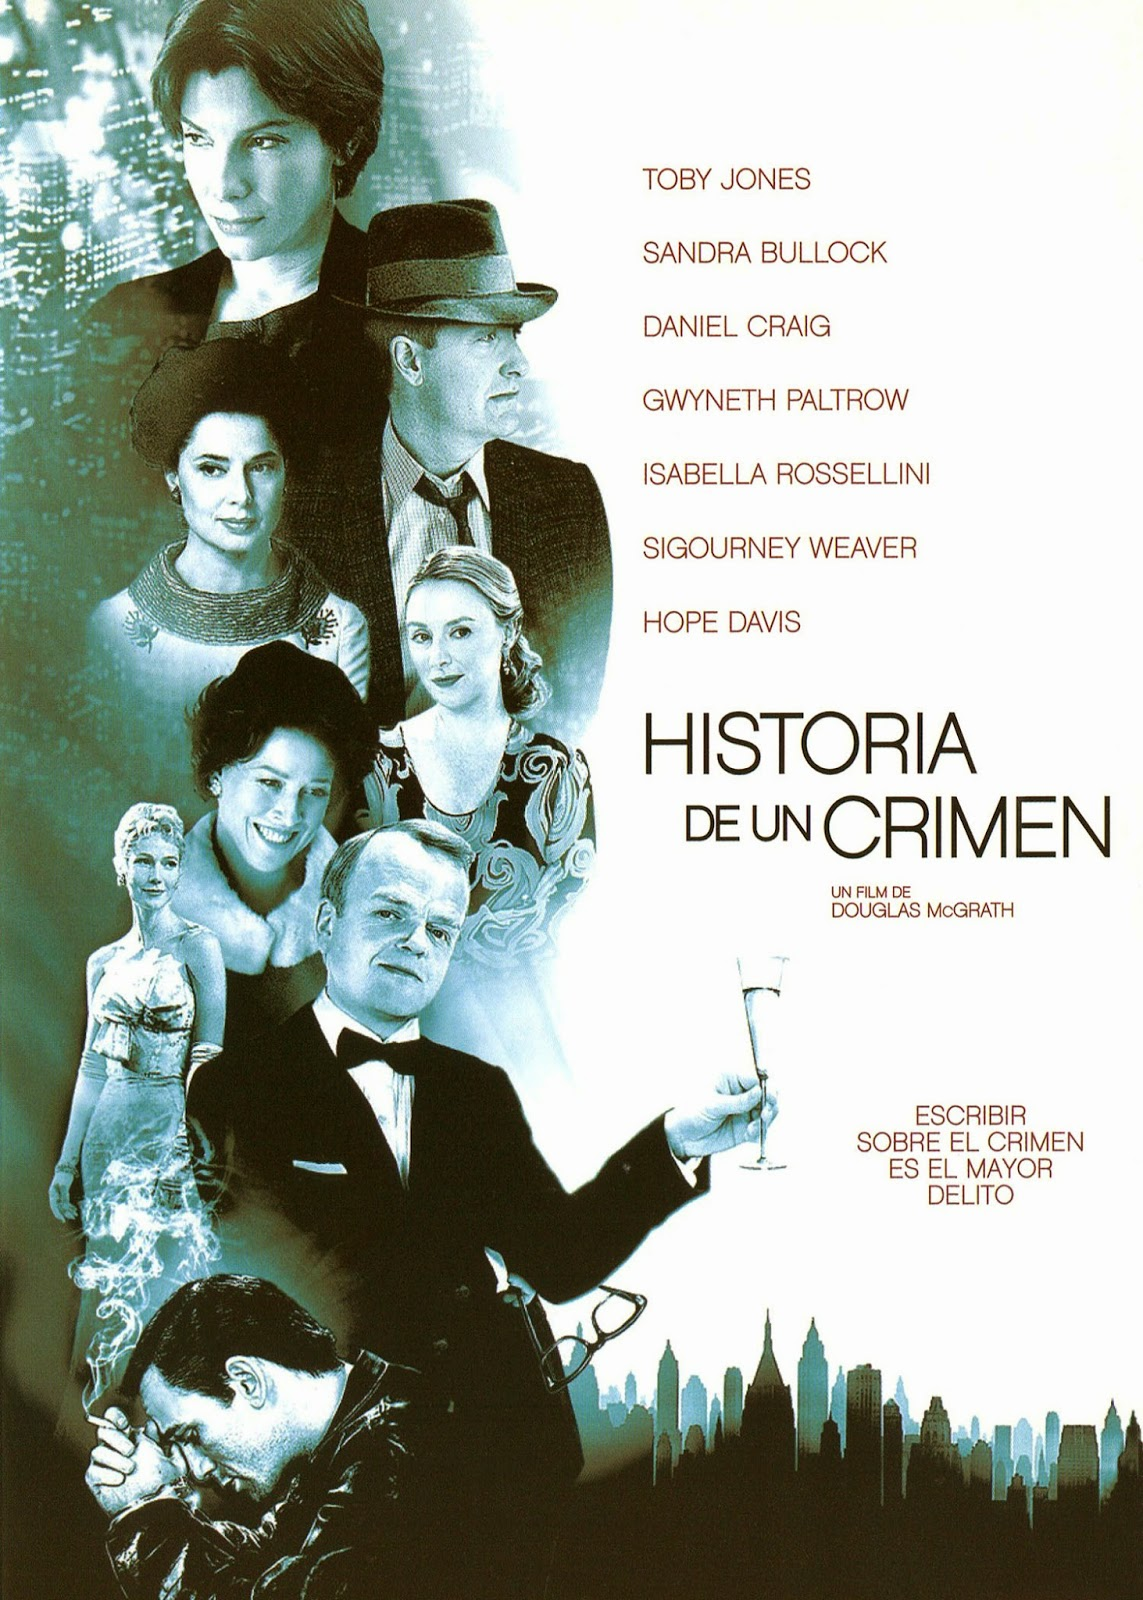 Historia De Un Crimen (2006) Drama